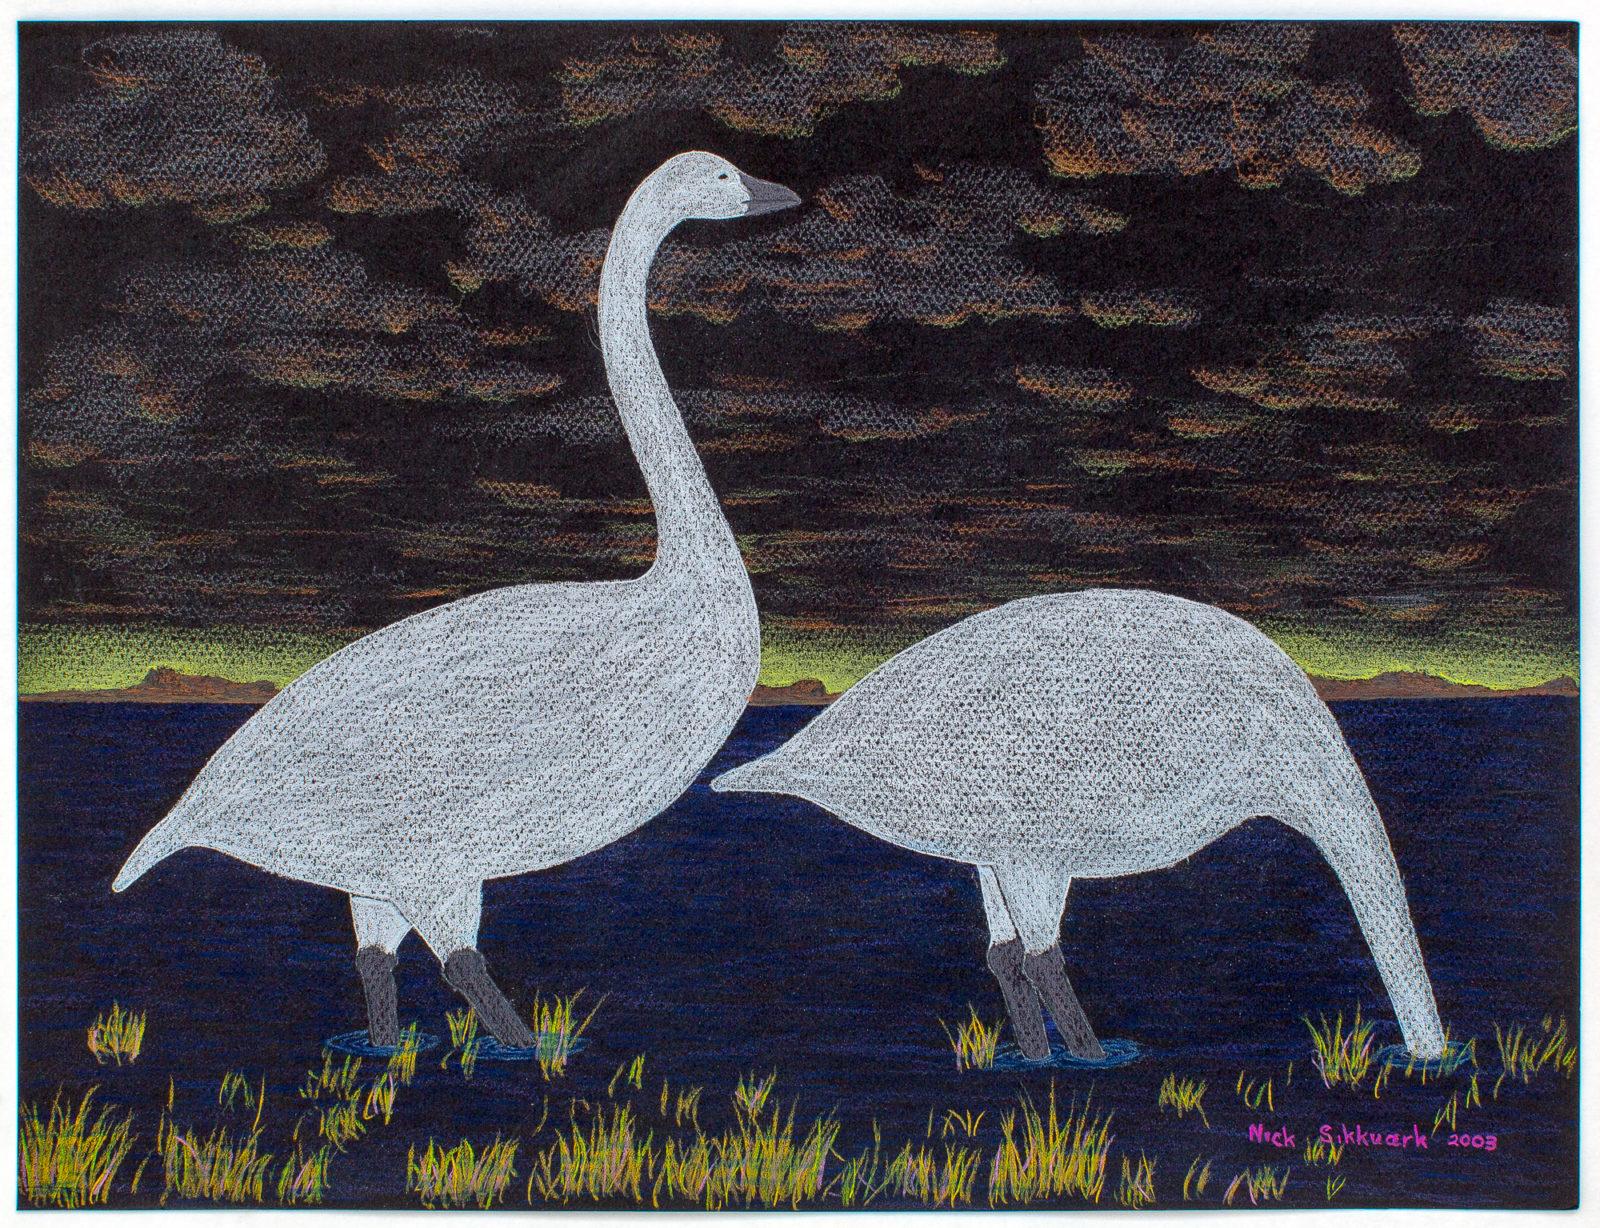 Nick Sikkuark - untitled (swans feeding)